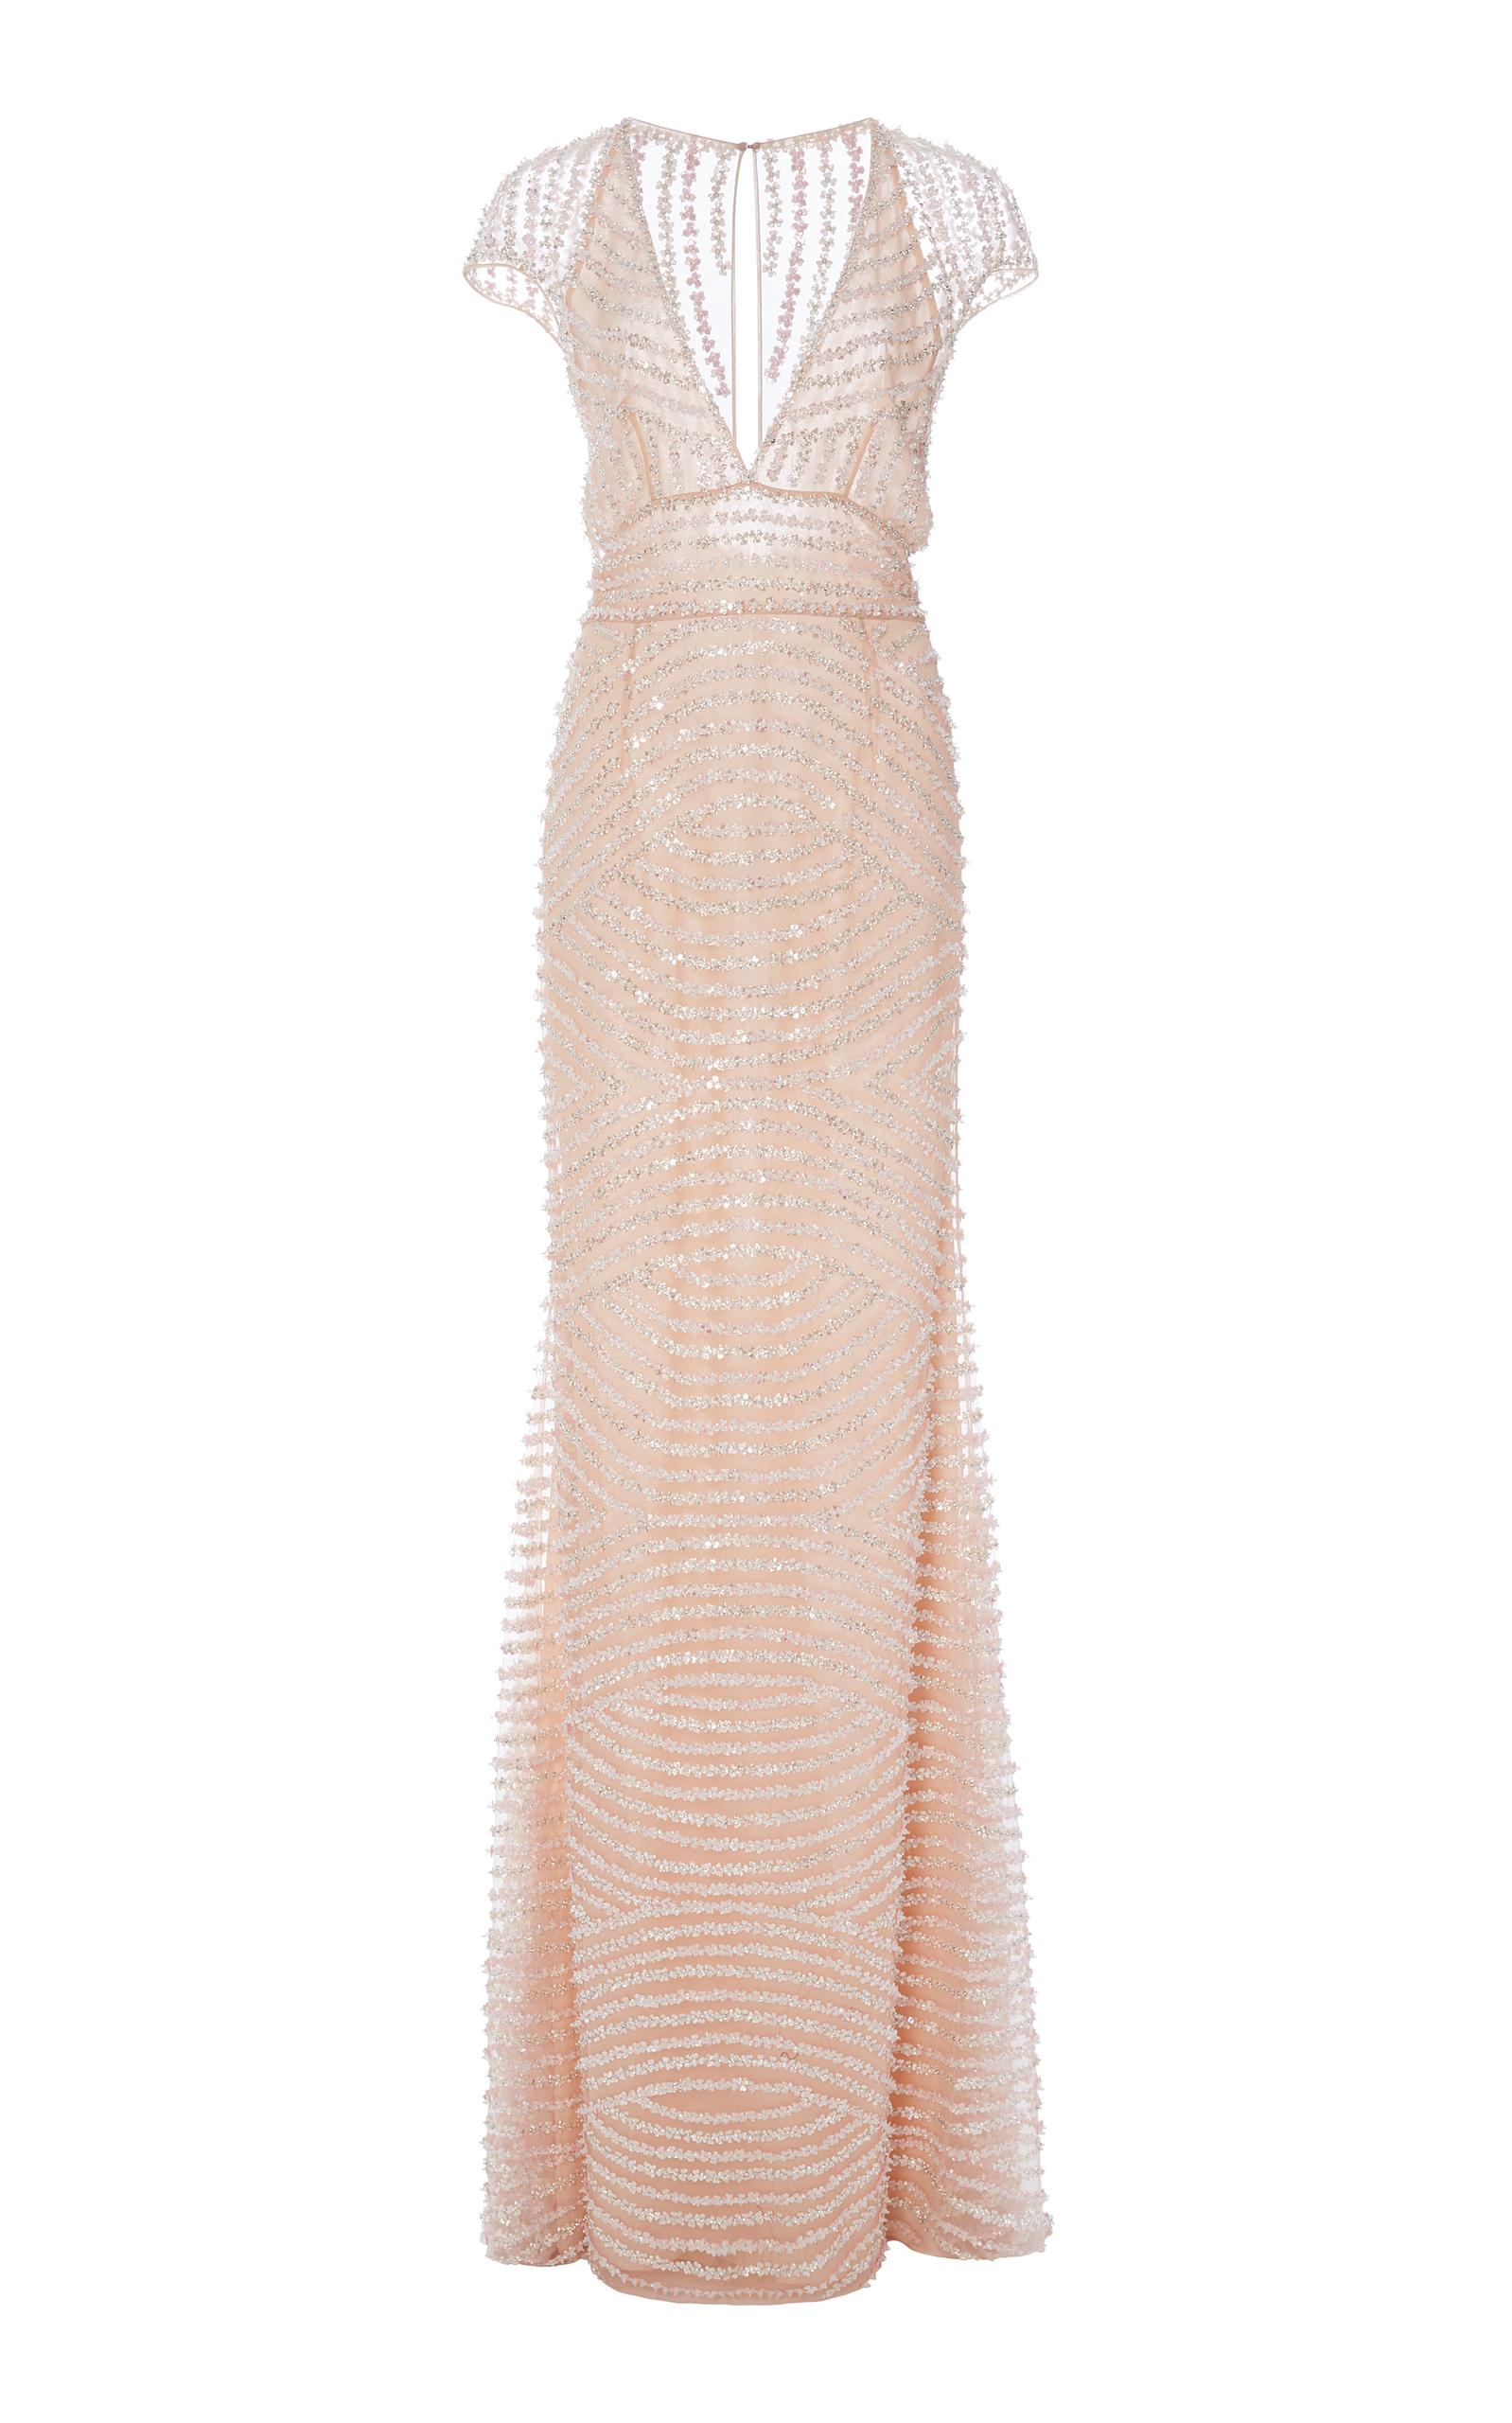 Short Sleeve Embellished Dress